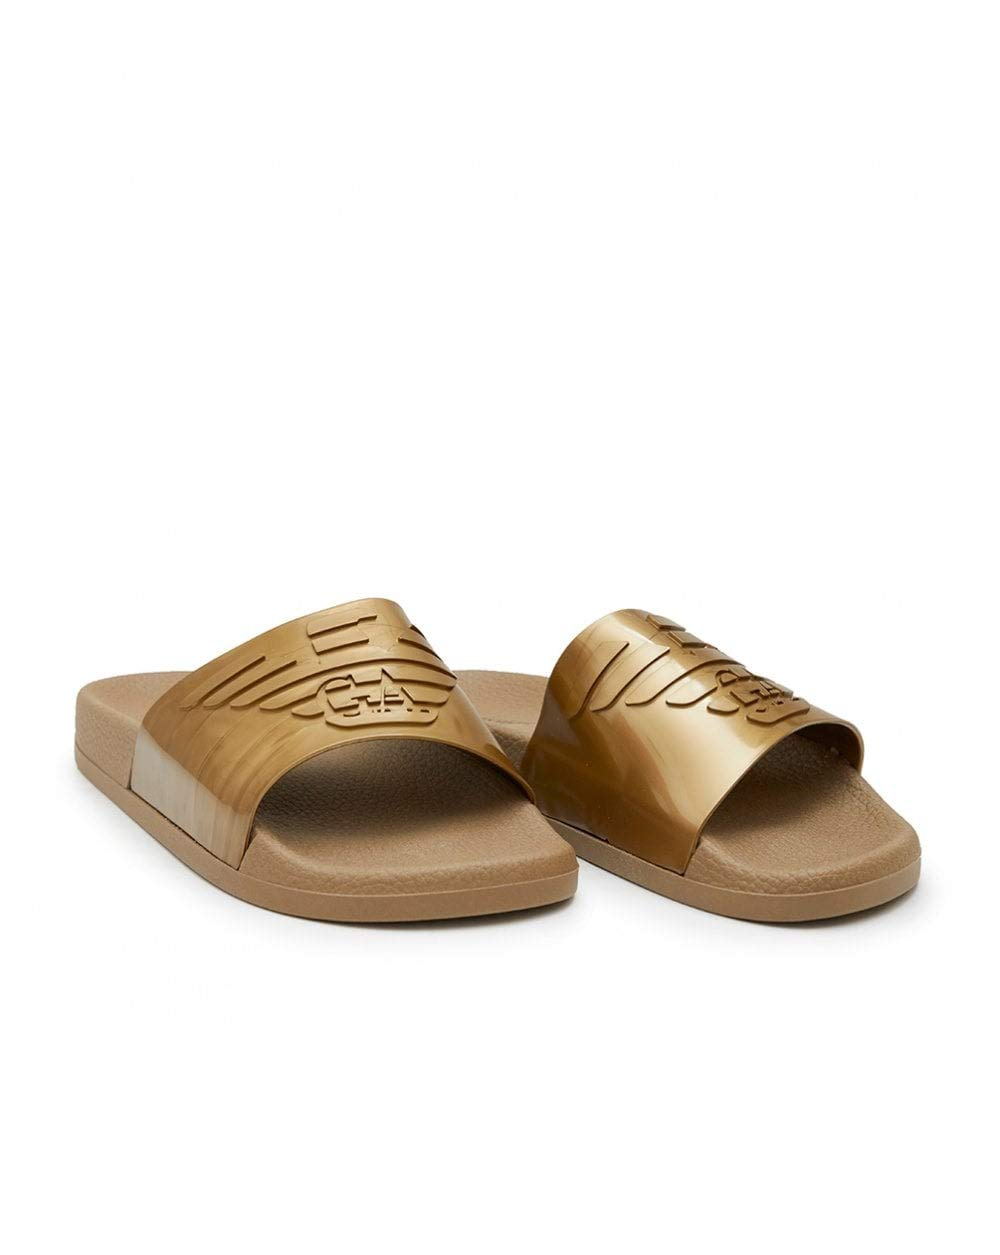 00069 gold Slippers flip flop woman sea or pool beachwear EMPORIO ARMANI article X3PS02 XL825 SLIPPER